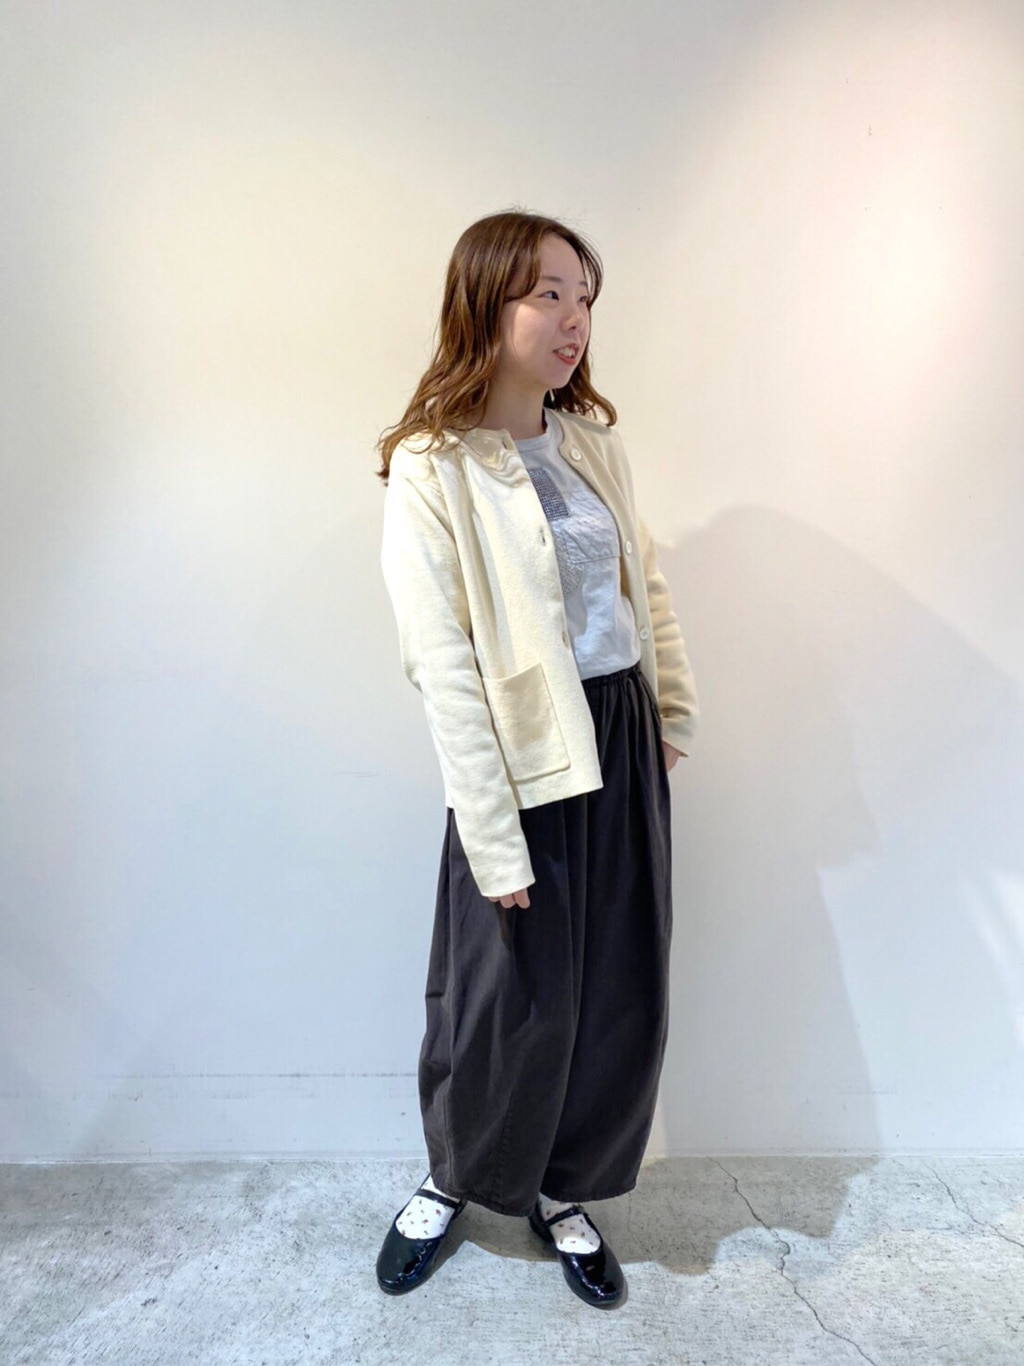 chambre de charme 京都路面 身長:155cm 2021.01.08